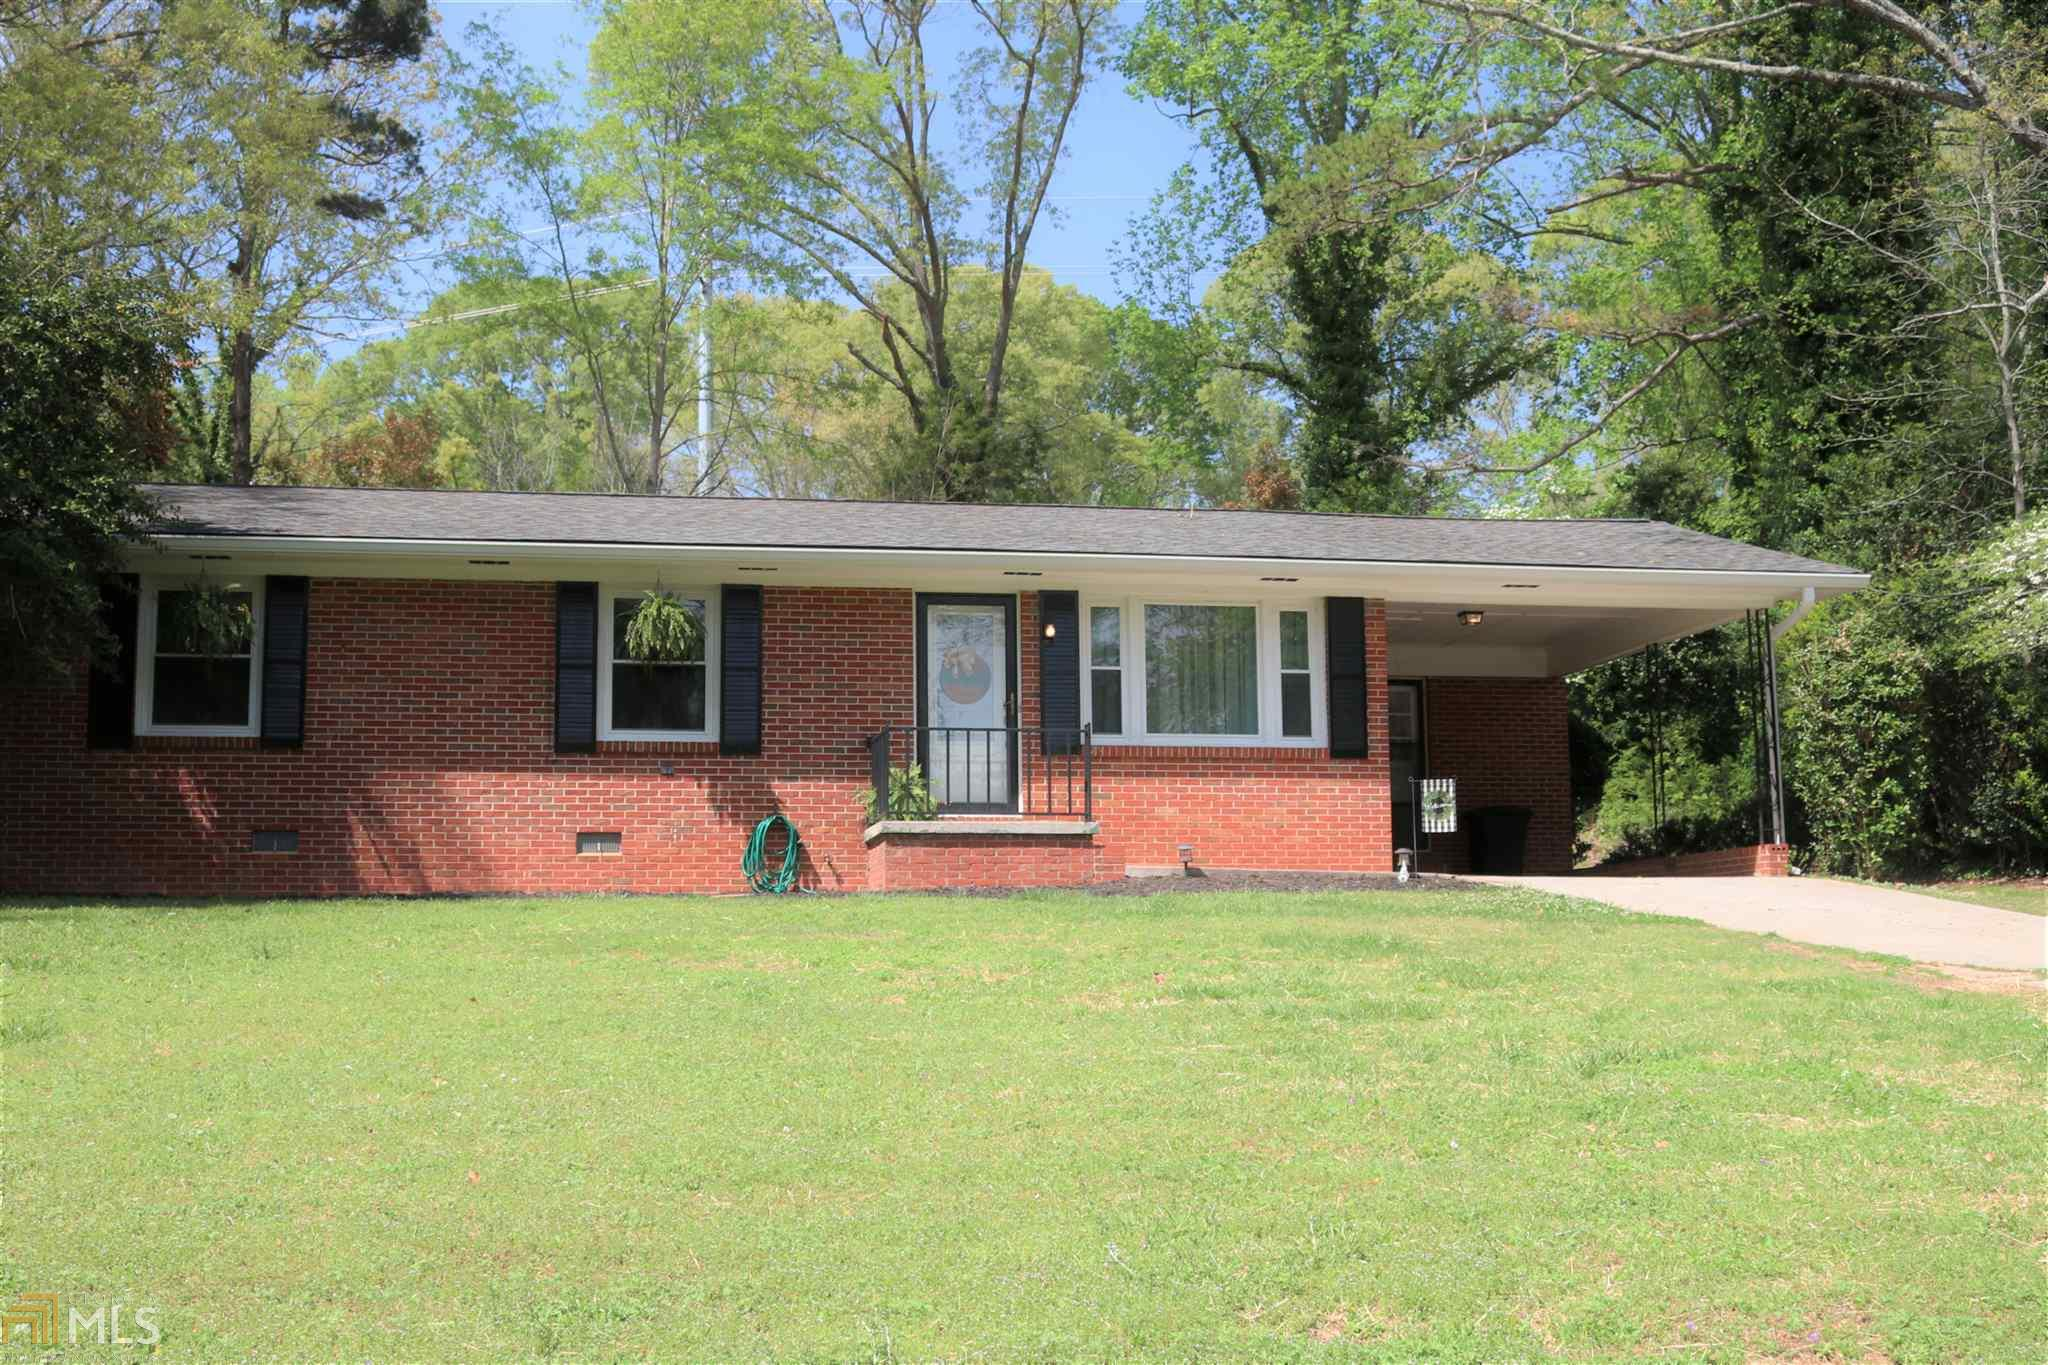 3634 Ledan Rd, Gainesville, Georgia 30506, 3 Bedrooms Bedrooms, ,2 BathroomsBathrooms,Single Family,For Sale,3634 Ledan Rd,1,8957900